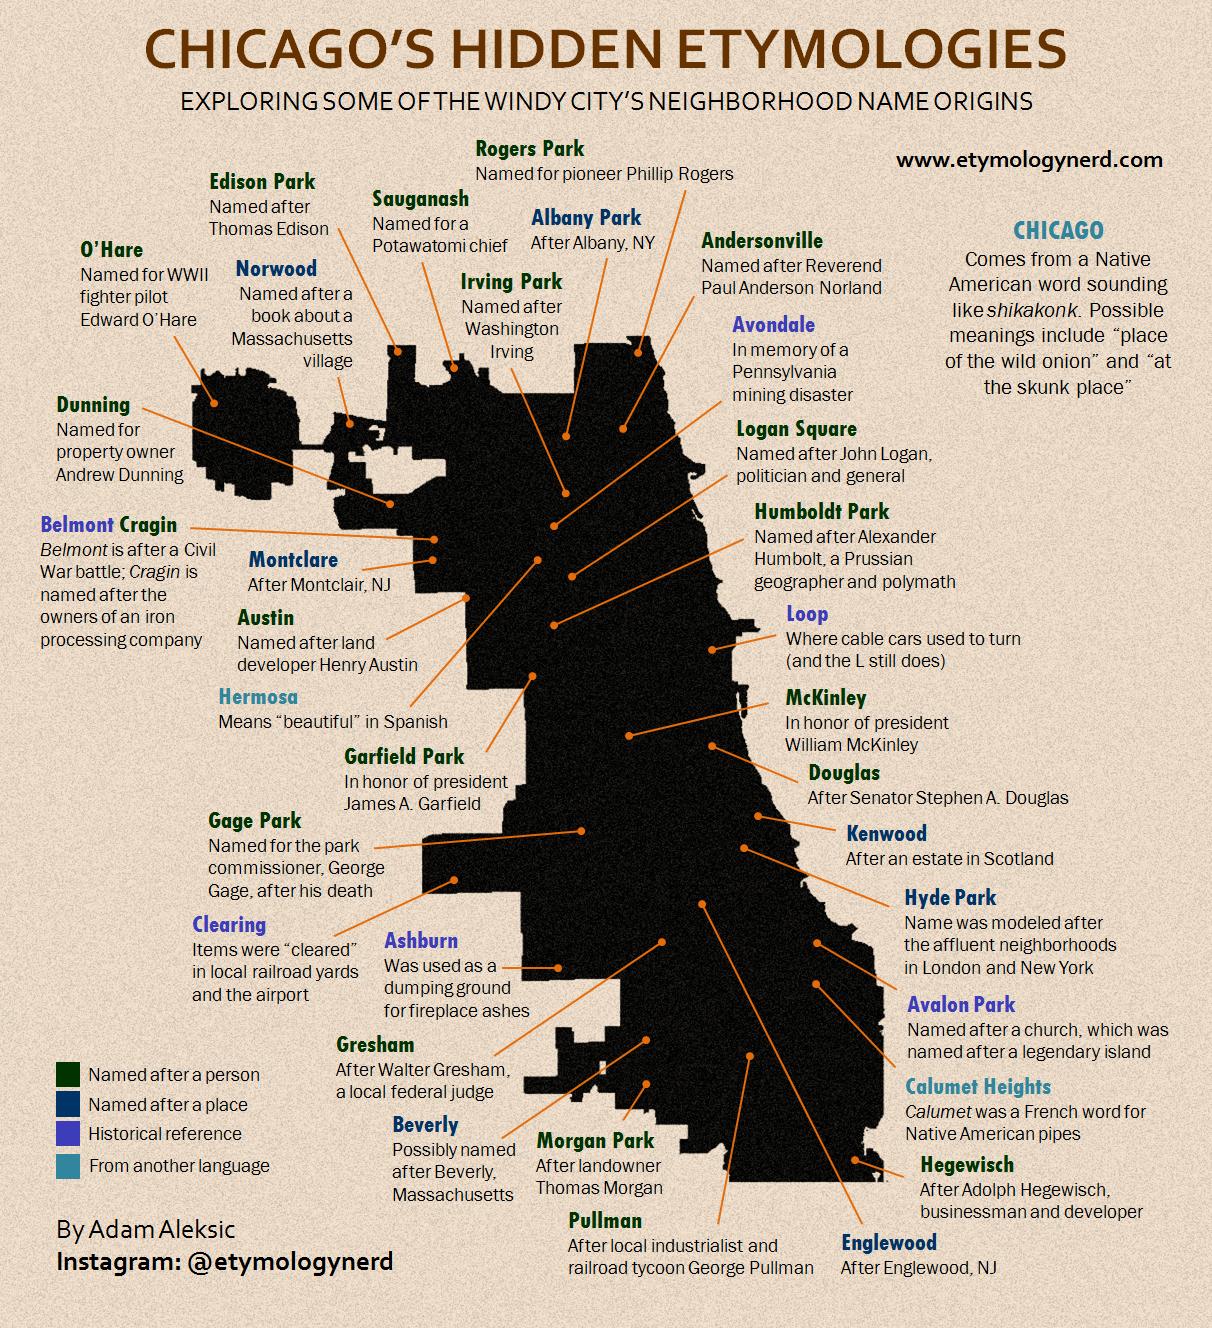 chicago hidden etymologies